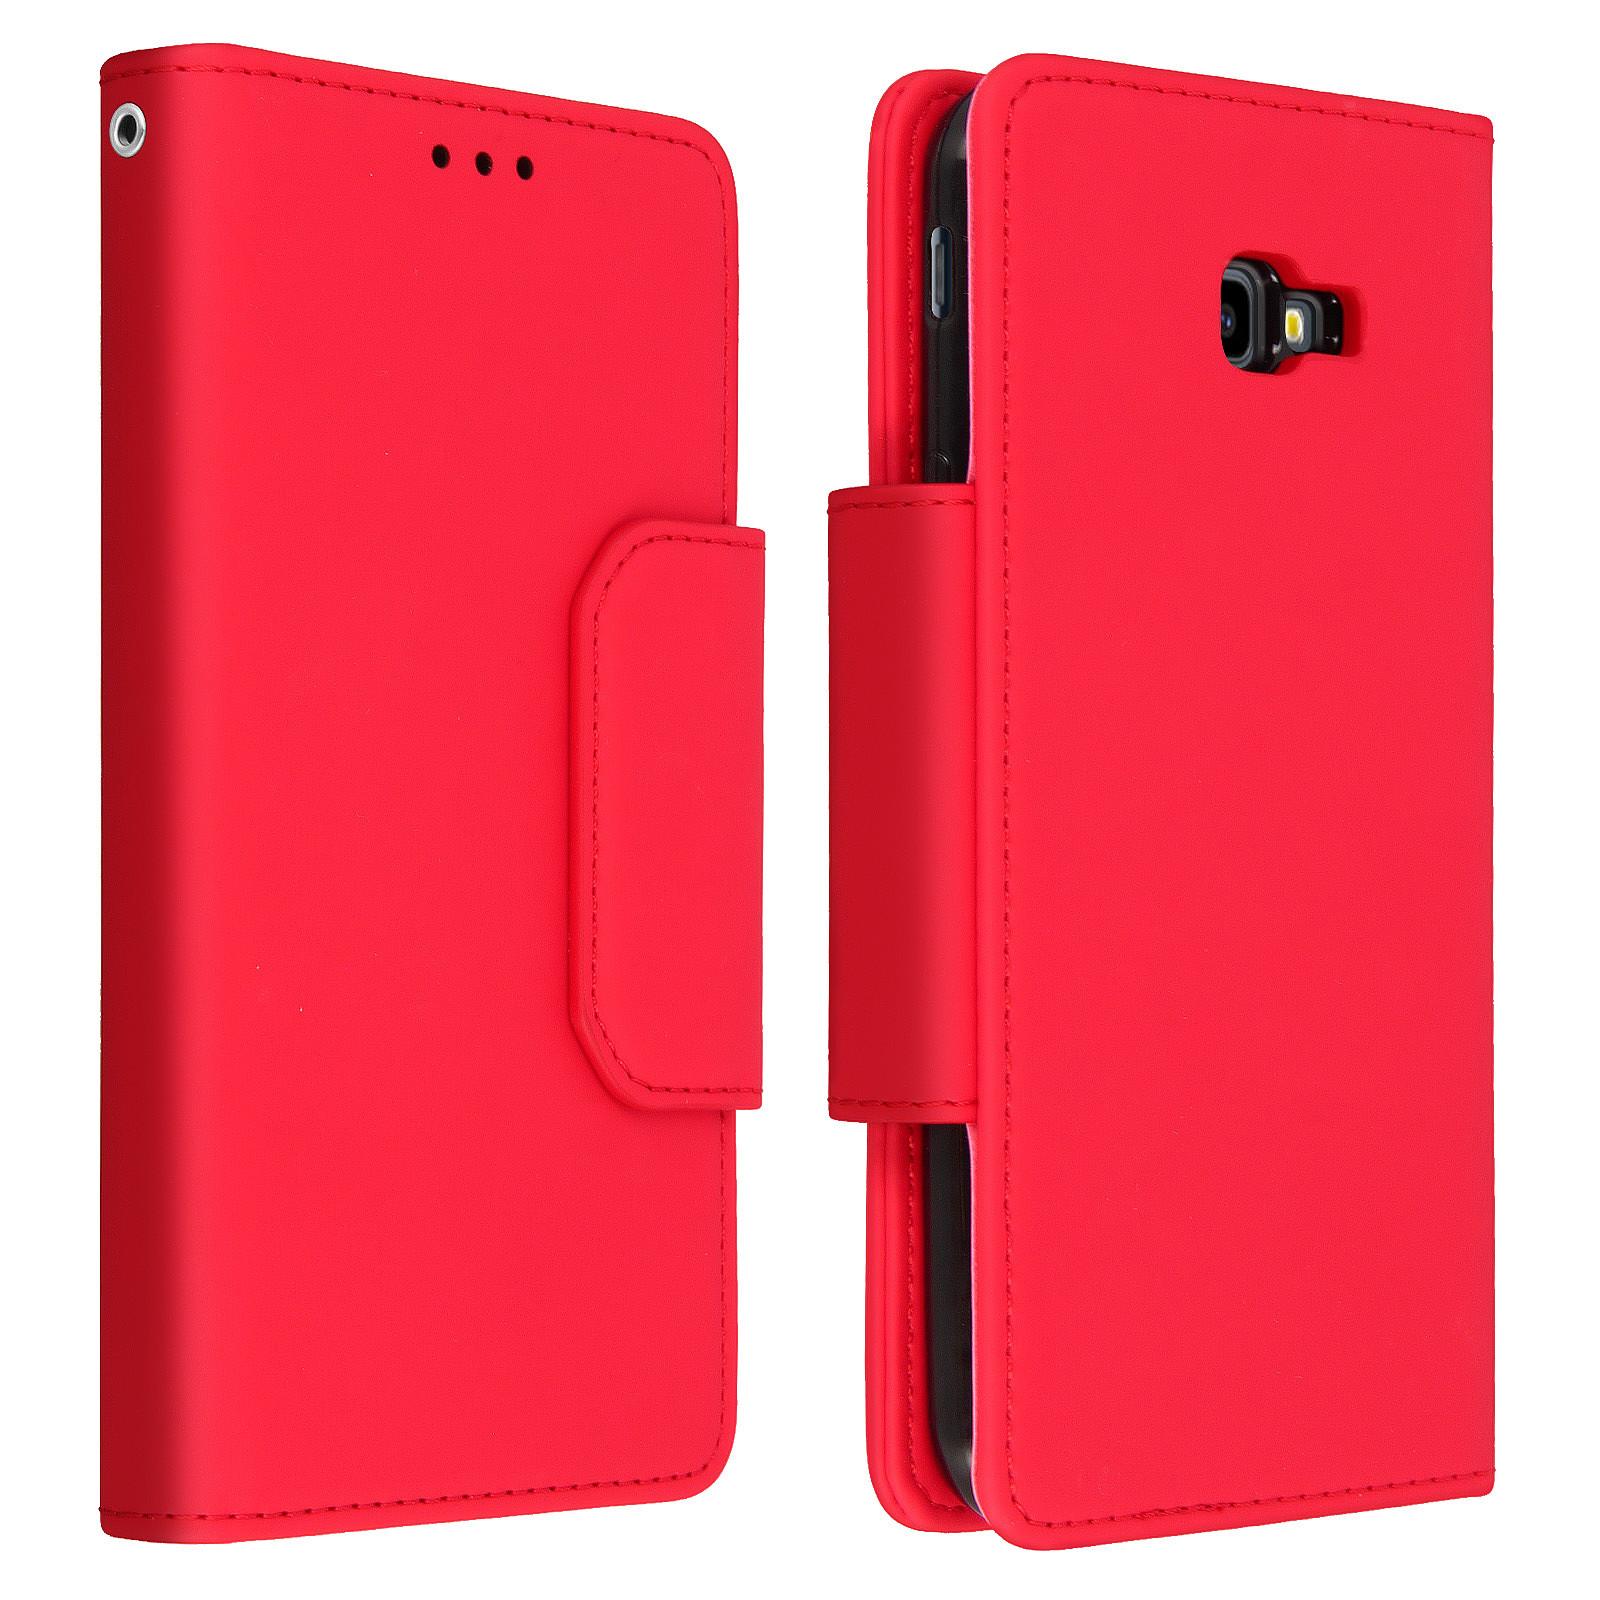 Avizar Etui folio Rouge Porte-Carte pour Samsung Galaxy J4 Plus